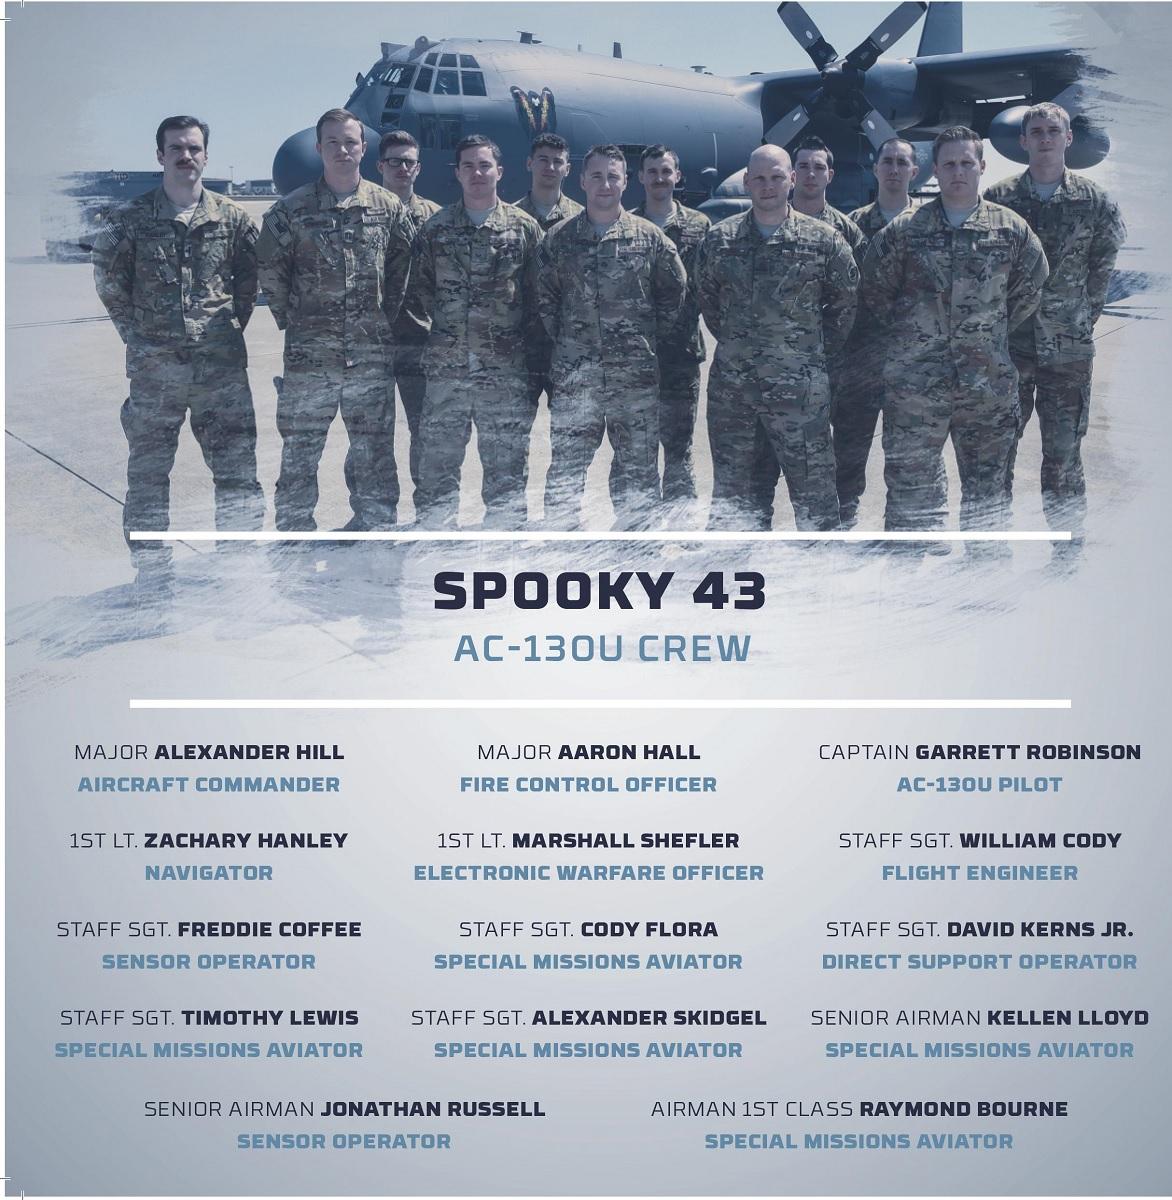 Spooky 43, AC-130U gunship crew